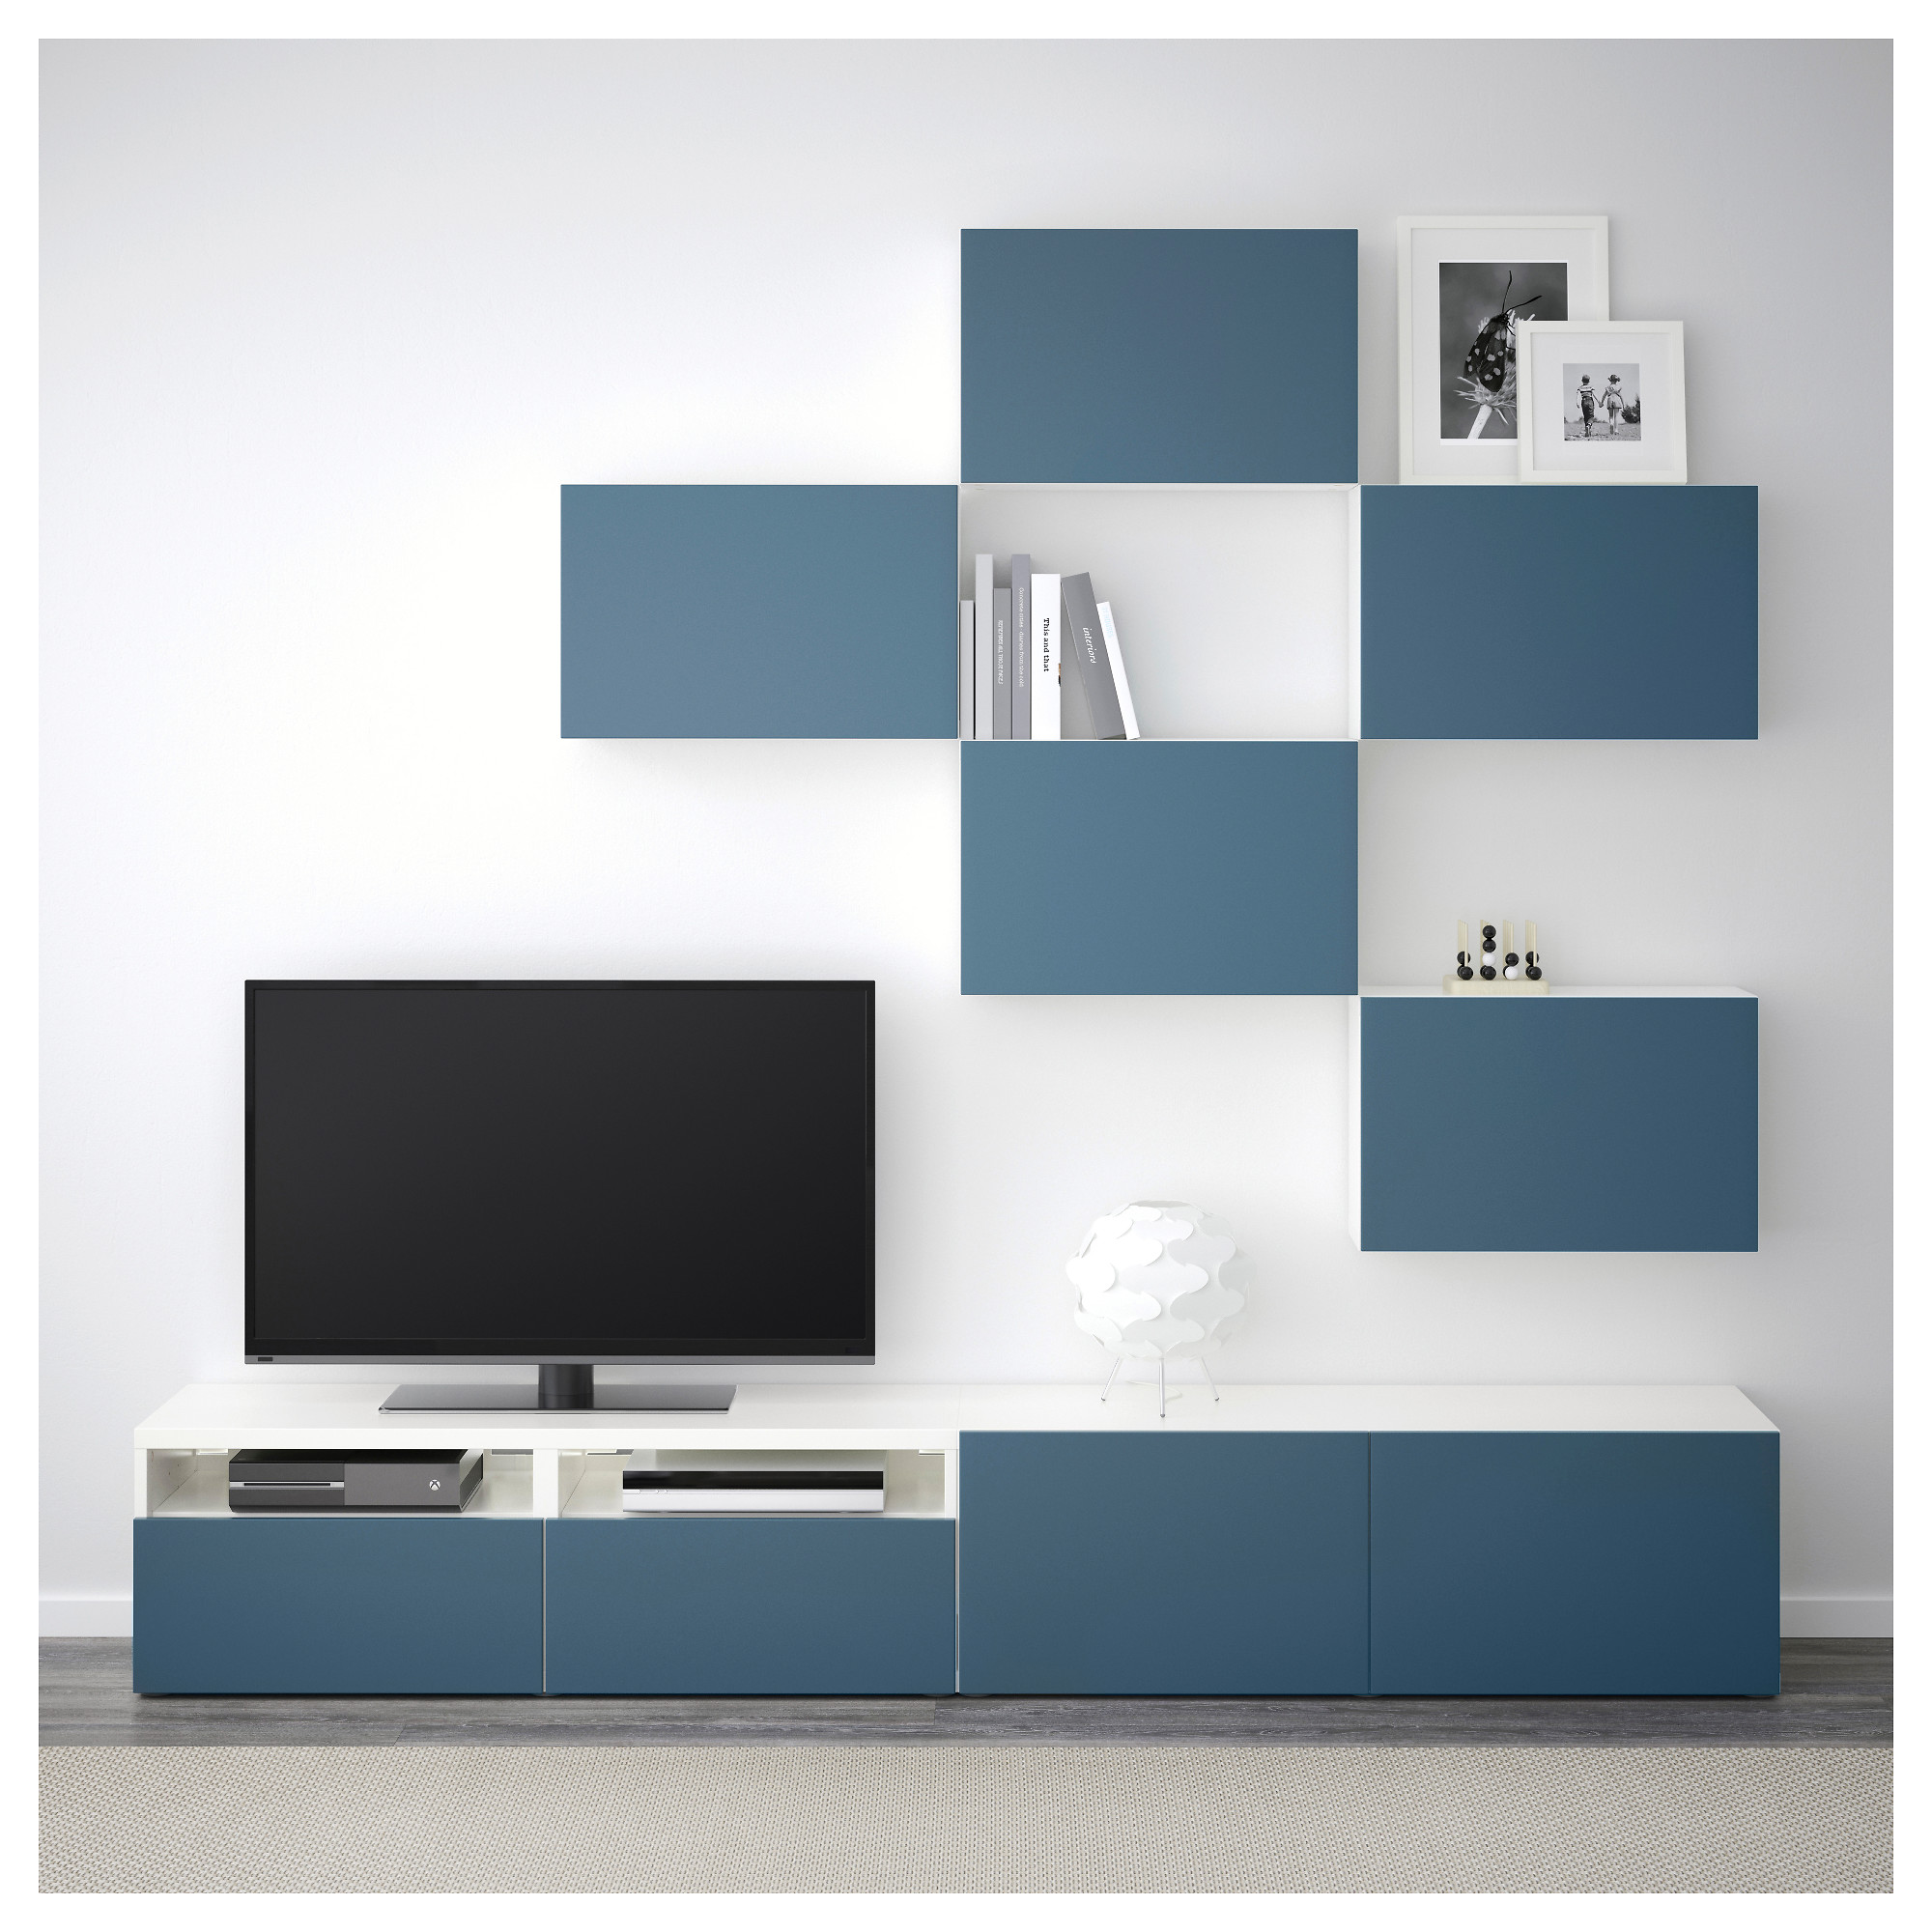 Шкаф для ТВ, комбинация БЕСТО темно-синий артикуль № 892.516.79 в наличии. Интернет каталог IKEA Беларусь. Недорогая доставка и установка.